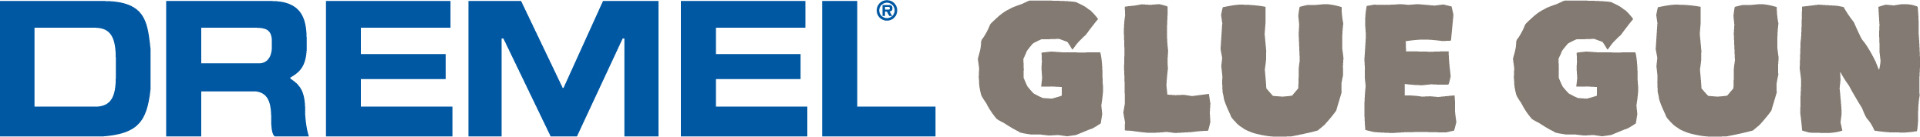 Dremel Glue Gun logo